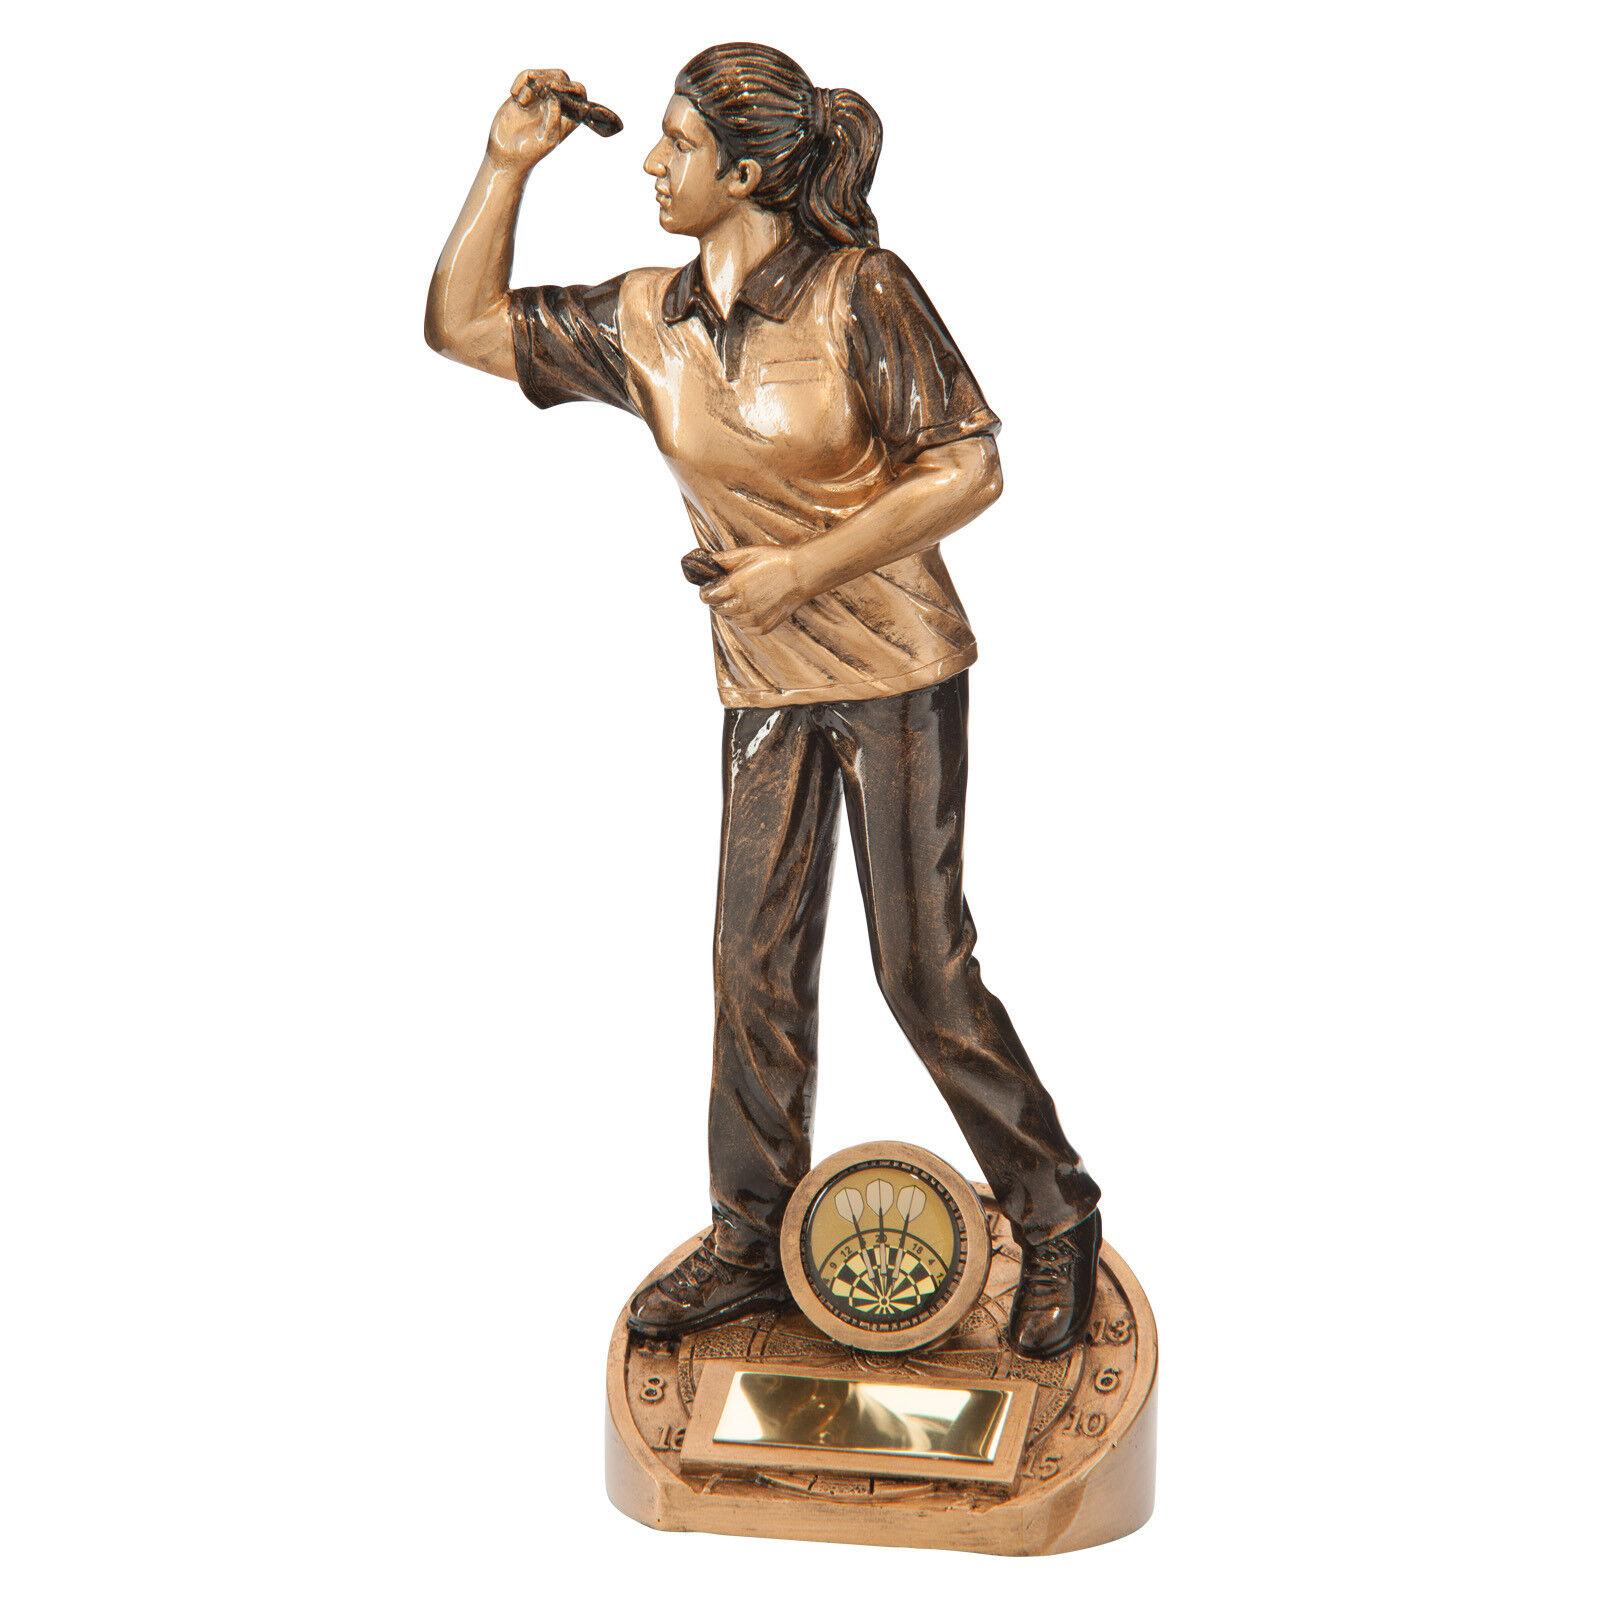 Bullseye Bullseye Bullseye femelle Fléchettes Figure trophées Awards 3 Tailles Gravure Gratuite 9a51c4